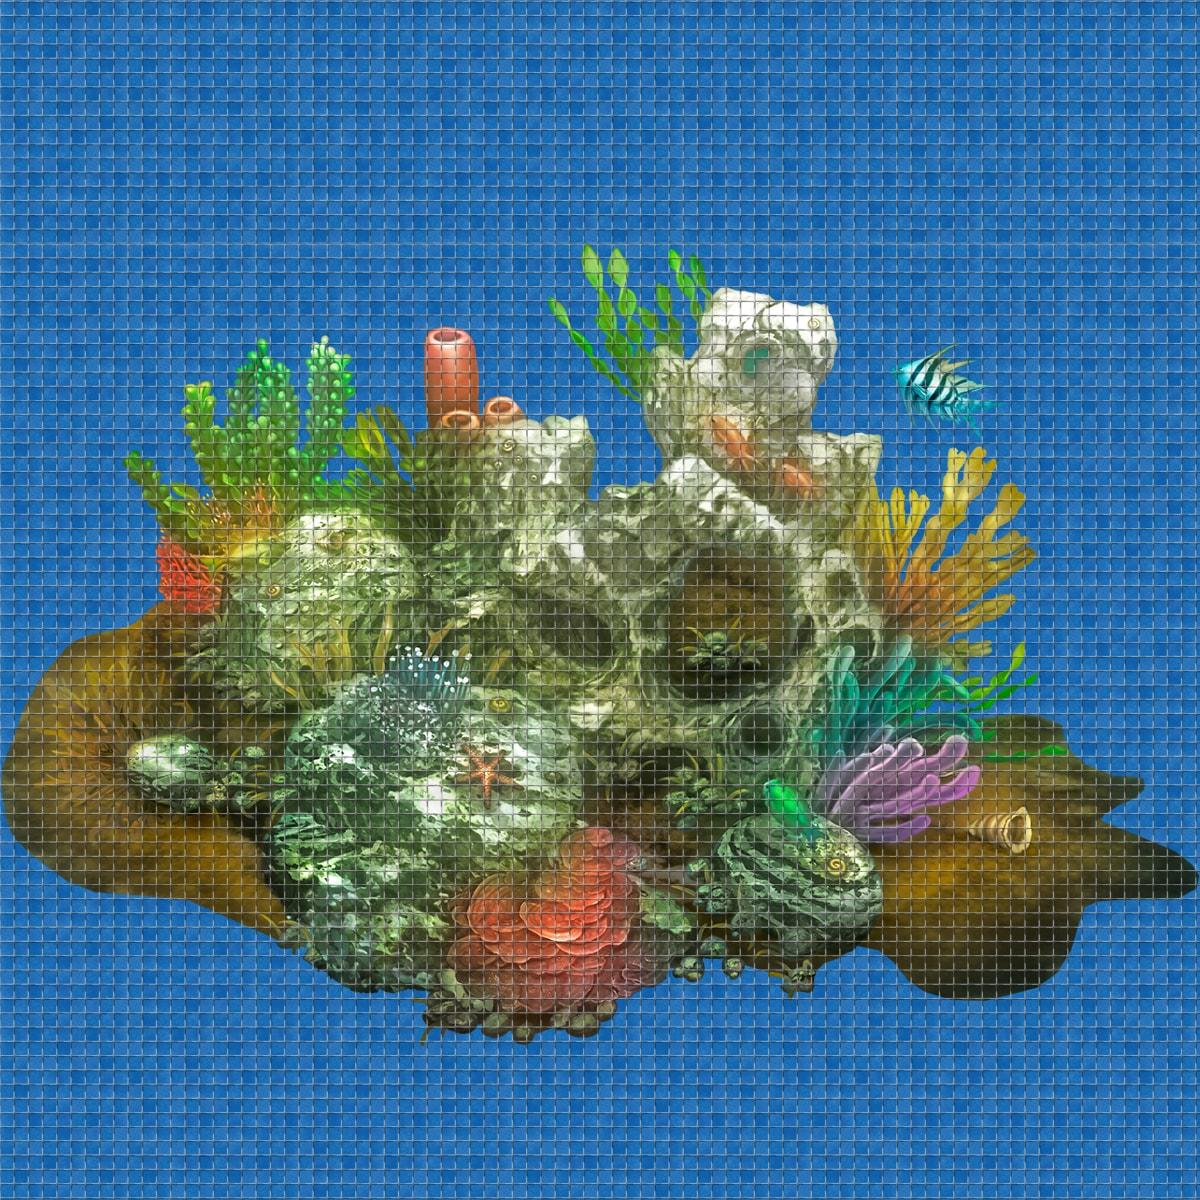 Aquarium-Digital_Print-Mosaic-Ezarri.jpg